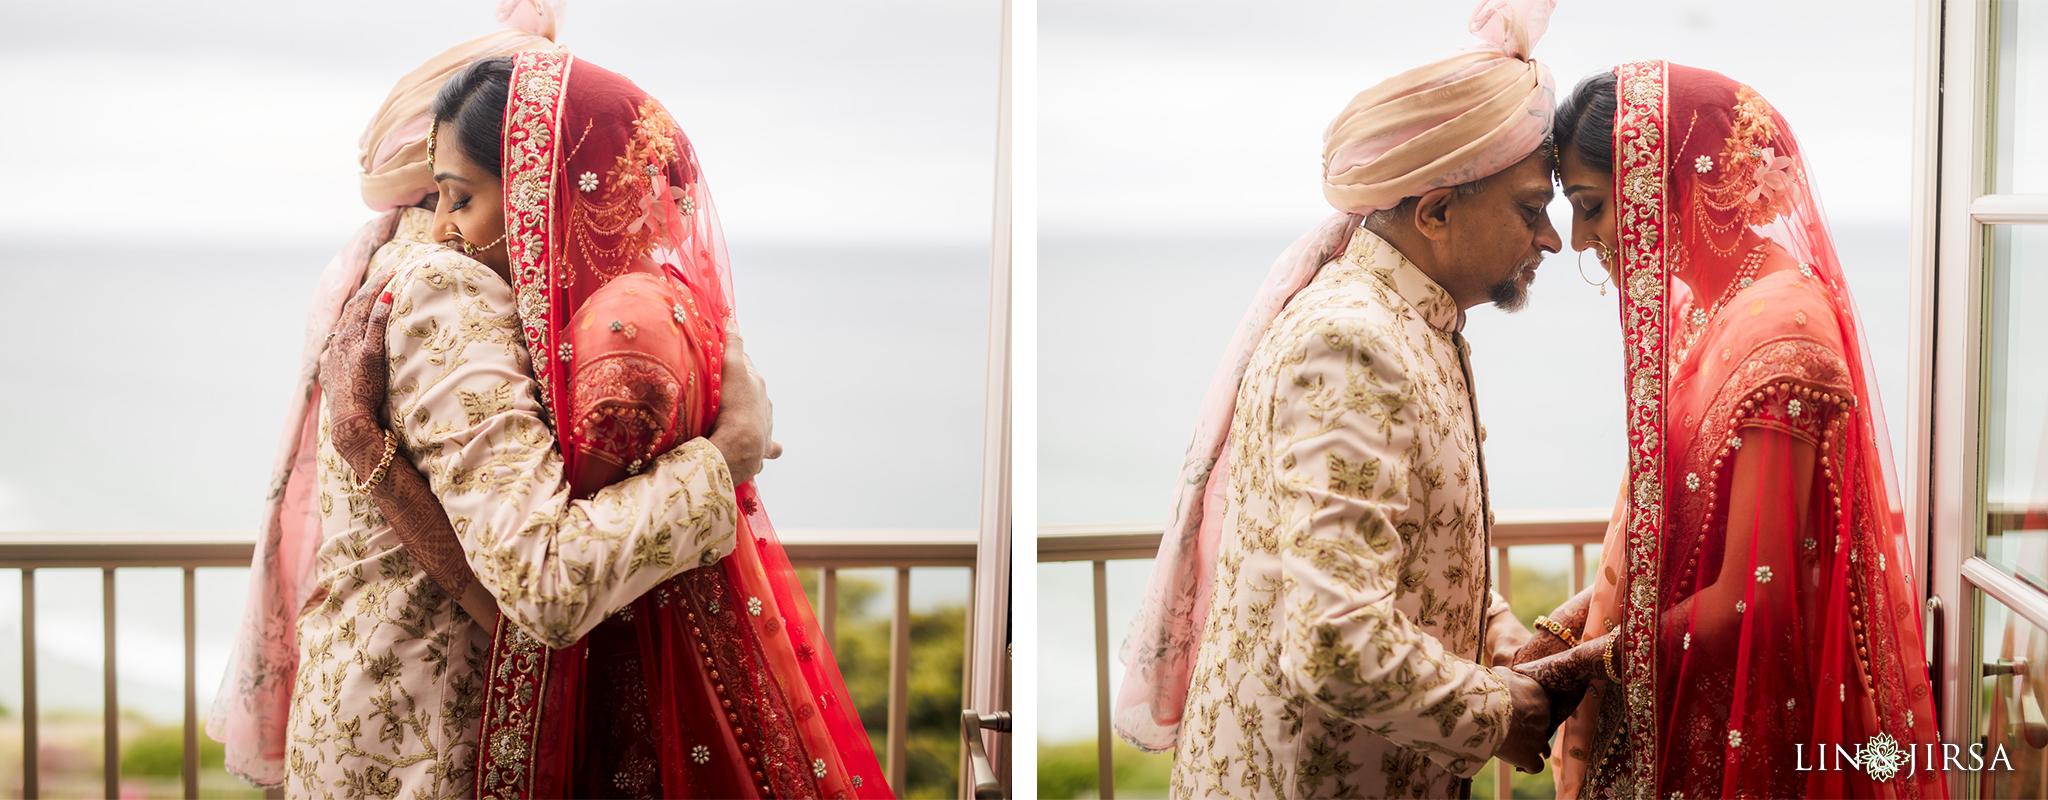 08 Ritz Carlton Laguna Niguel Indian Wedding Photography